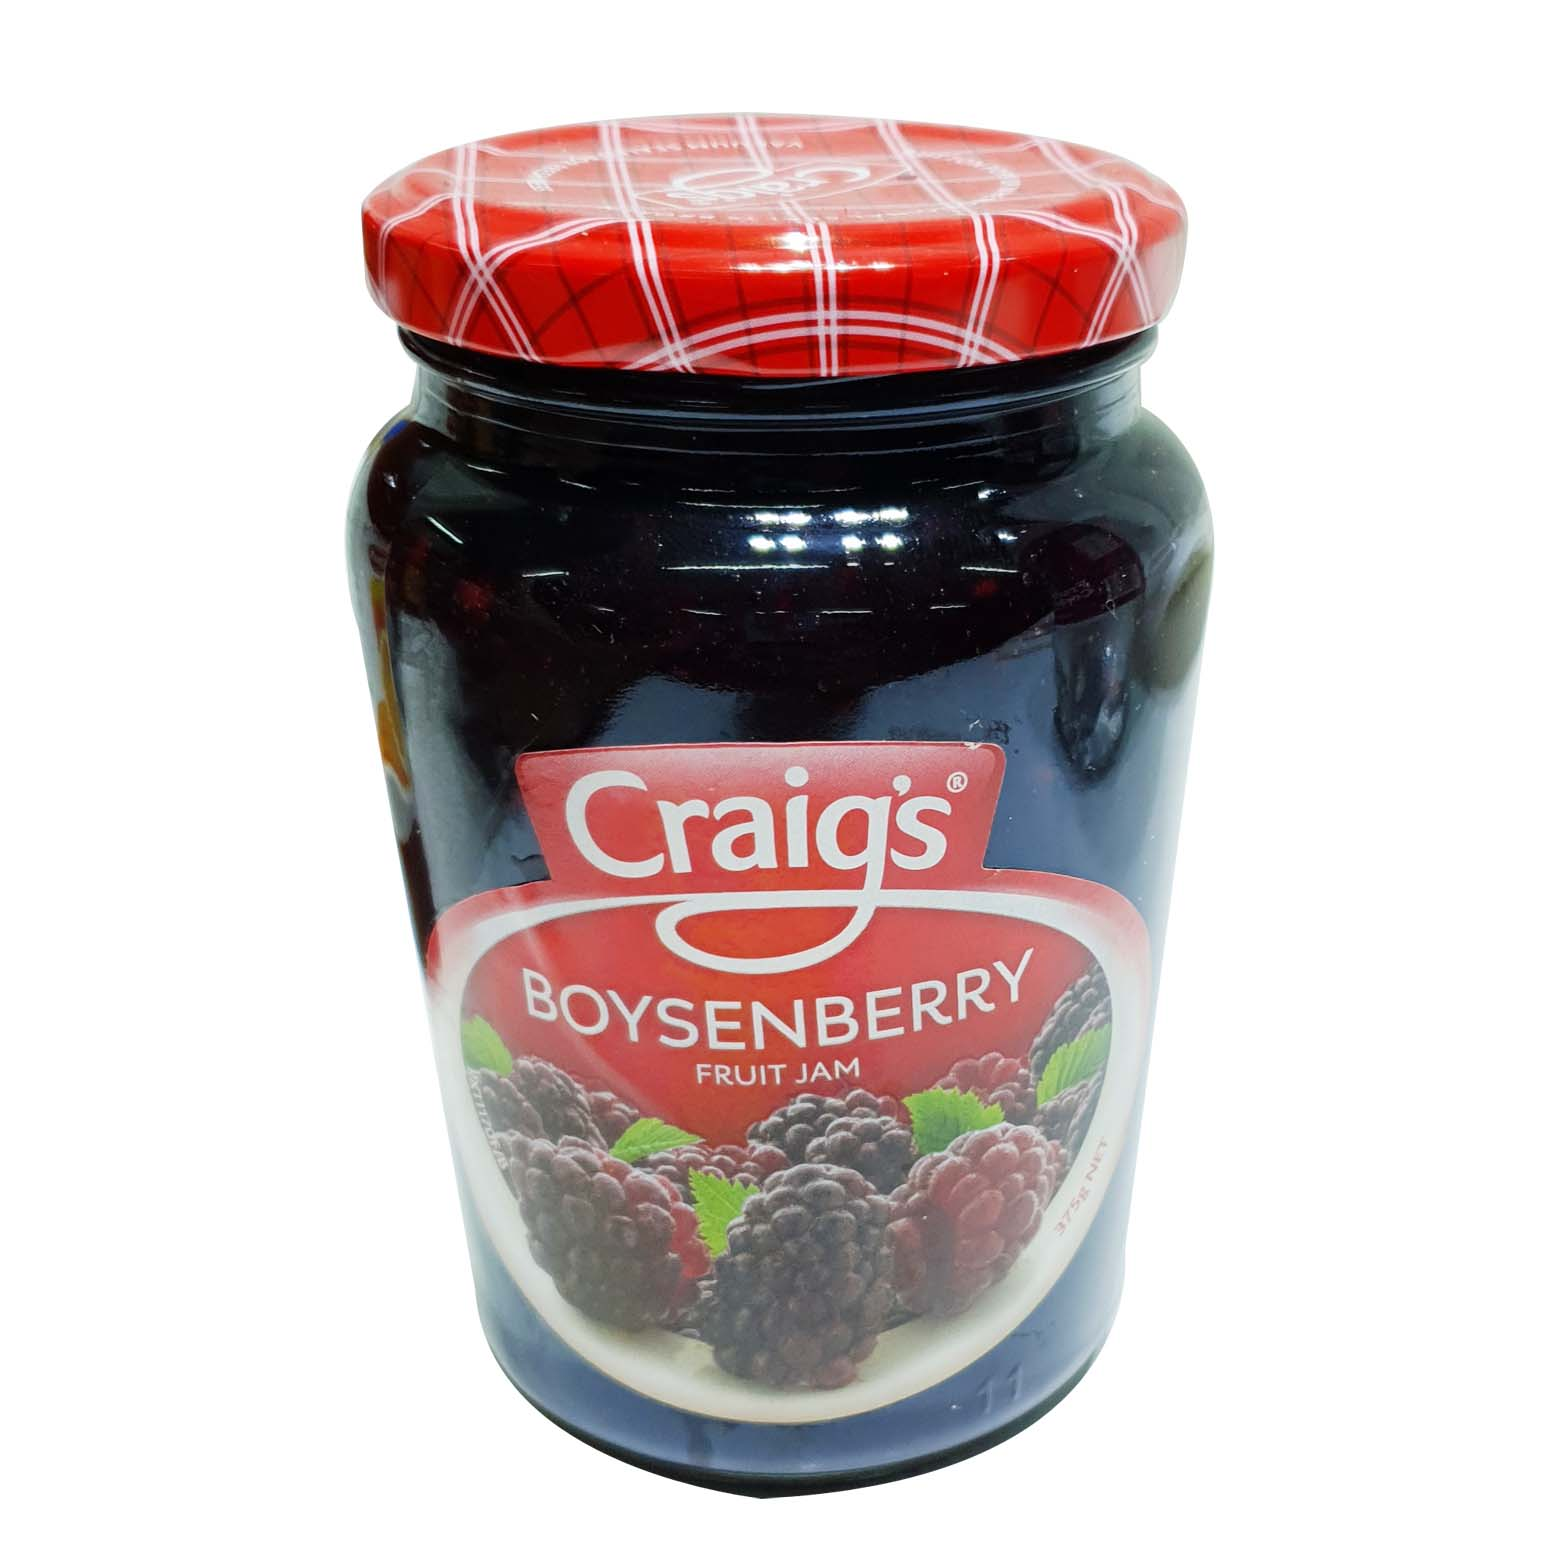 Craigs Boysenberry Fruit Jam 375g